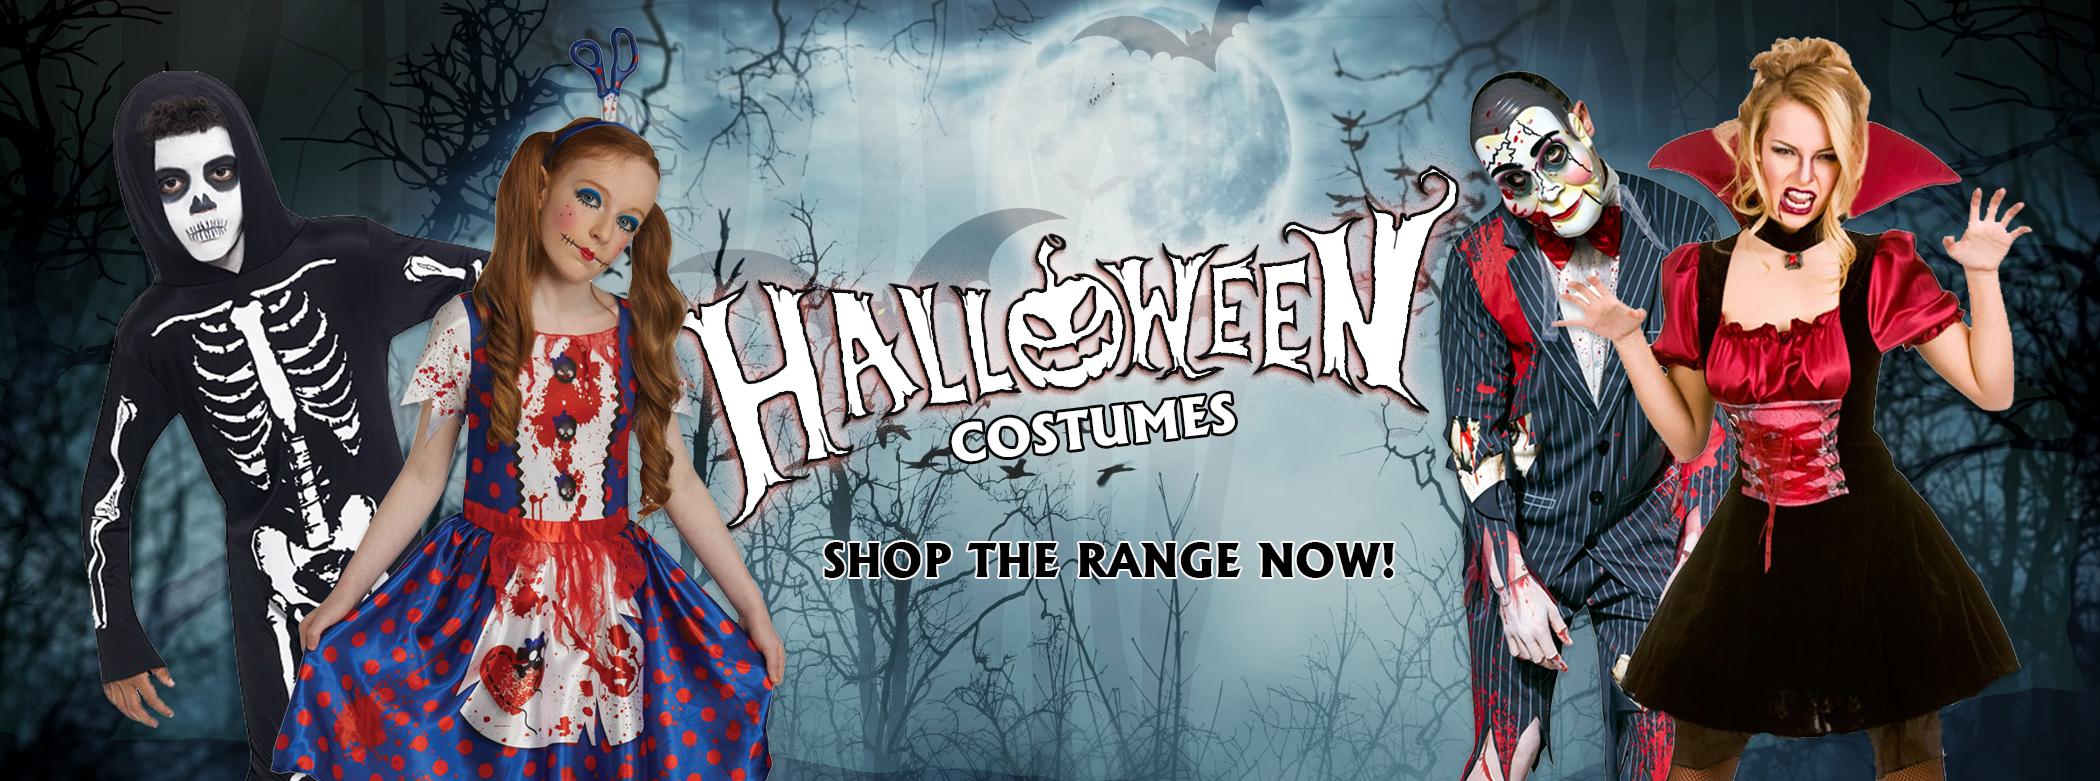 Trending Fancy Dress Halloween Costumes from Budget Fever